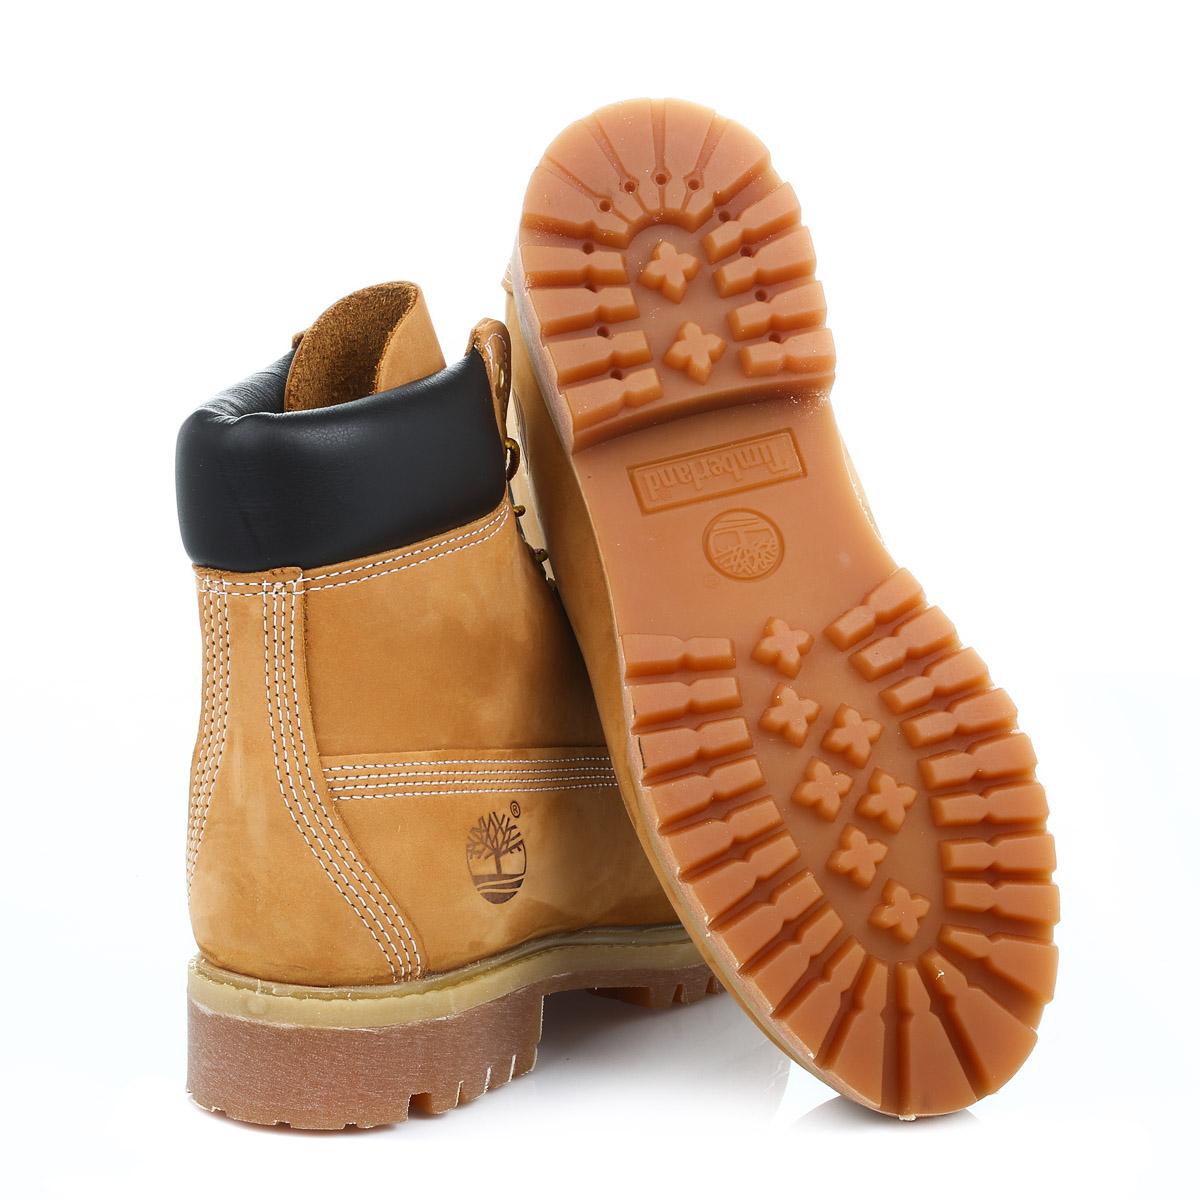 Timberland Mens Premium Grano 6 Pollici Stivali Di Pelle Nubuck AA2cs